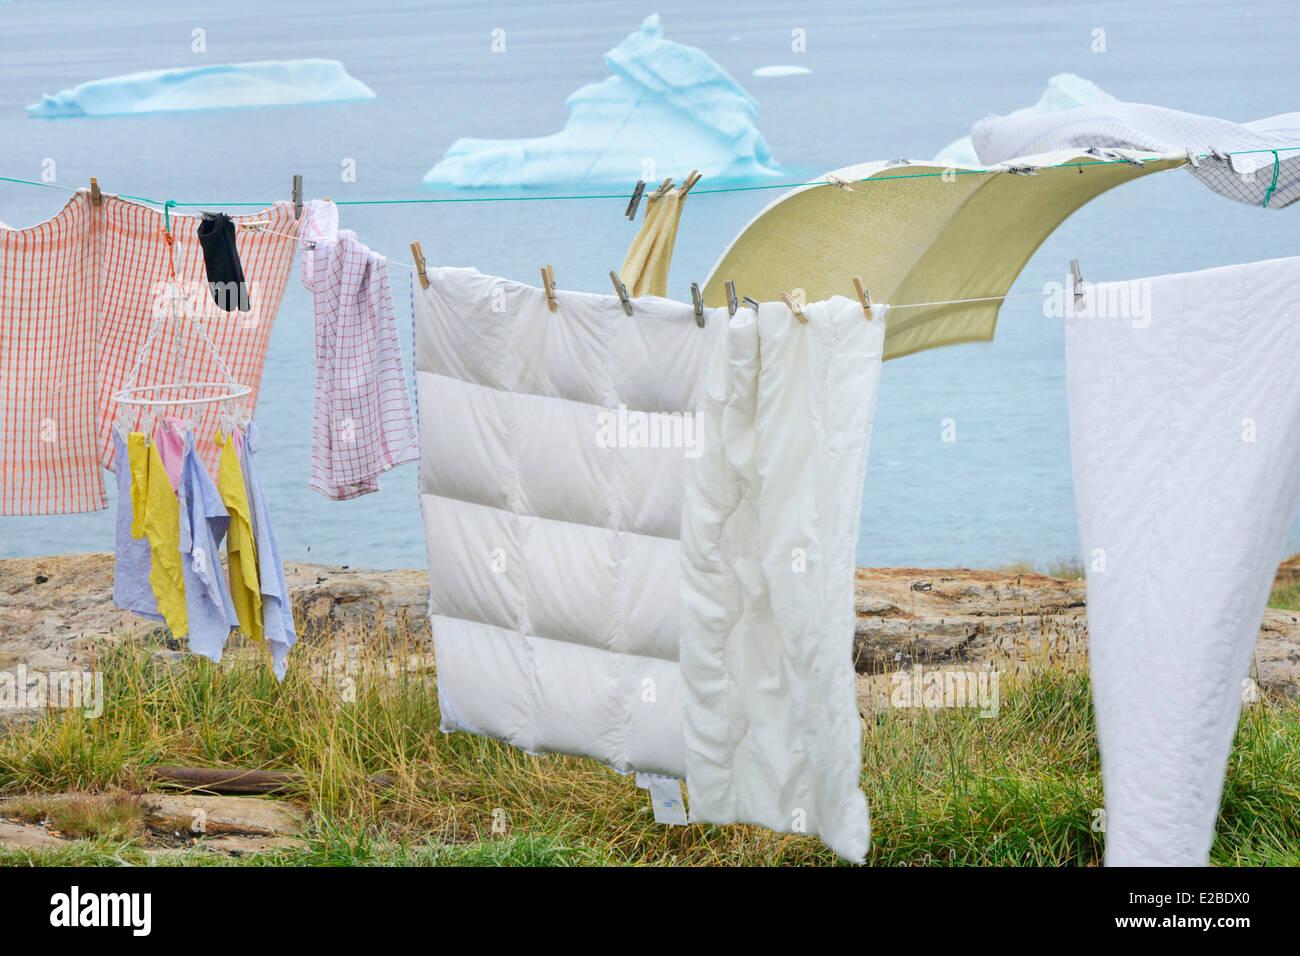 Greenland, Baffin Bay, Nutaarmiut, Drying laundry - Stock Image